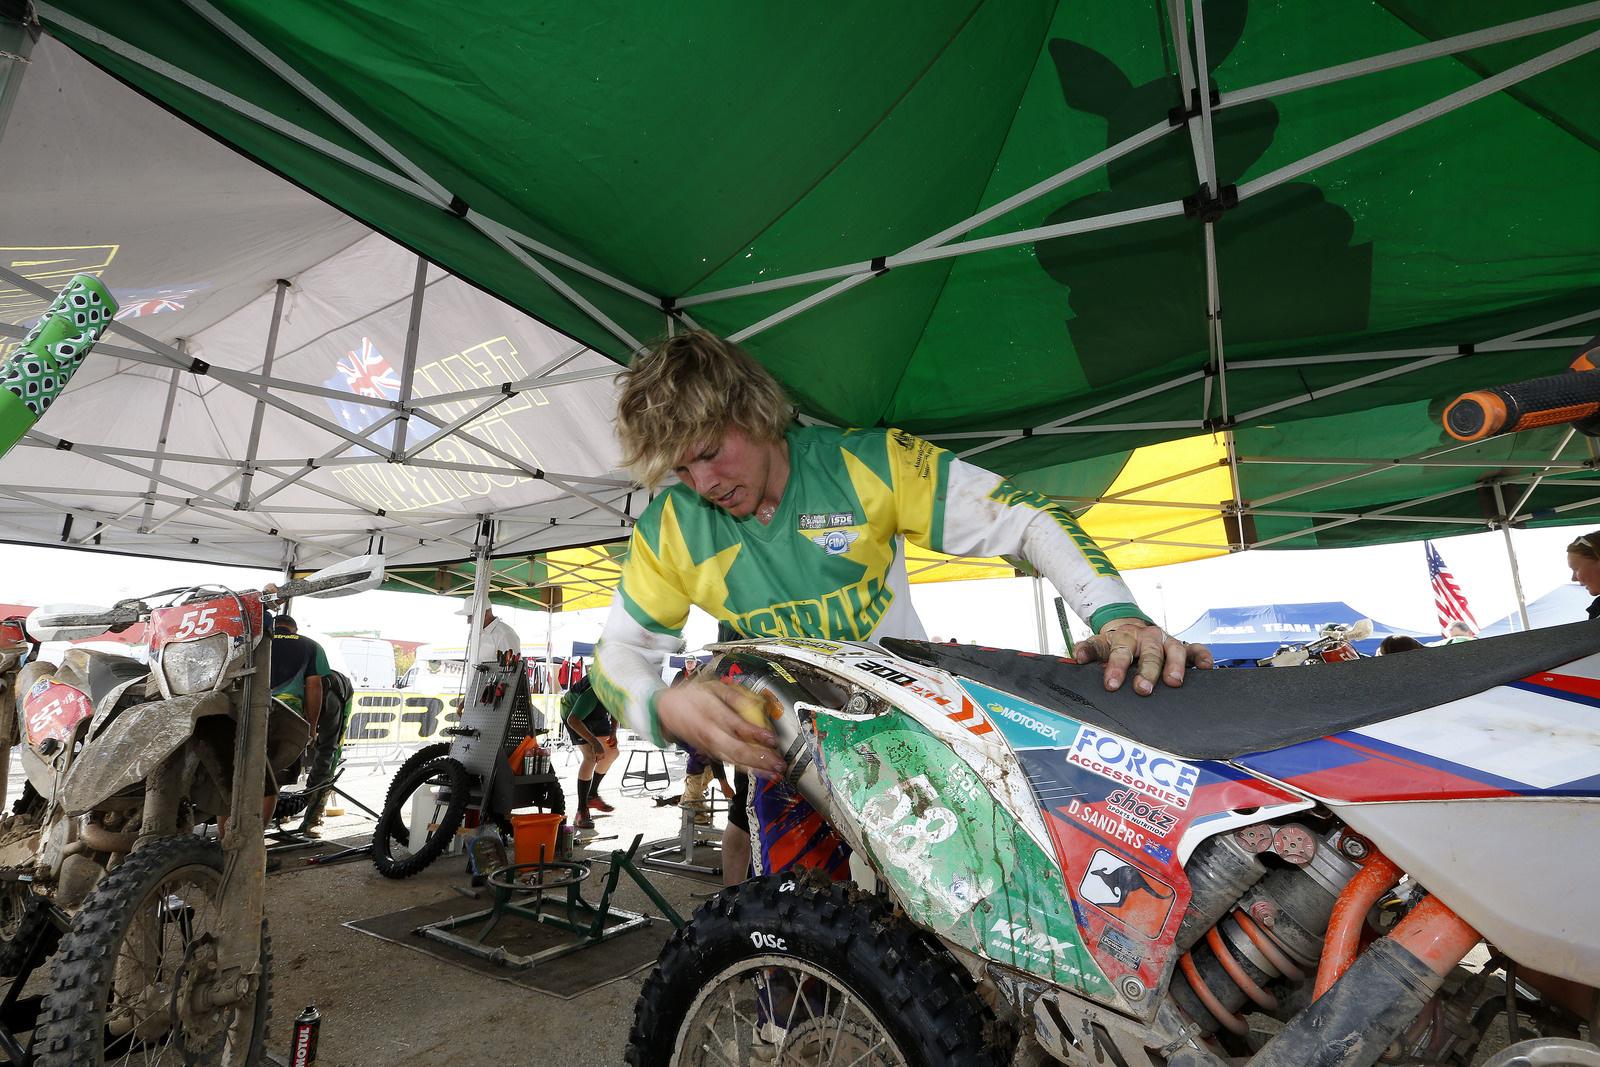 Daniel SANDERS (AUS, KTM)